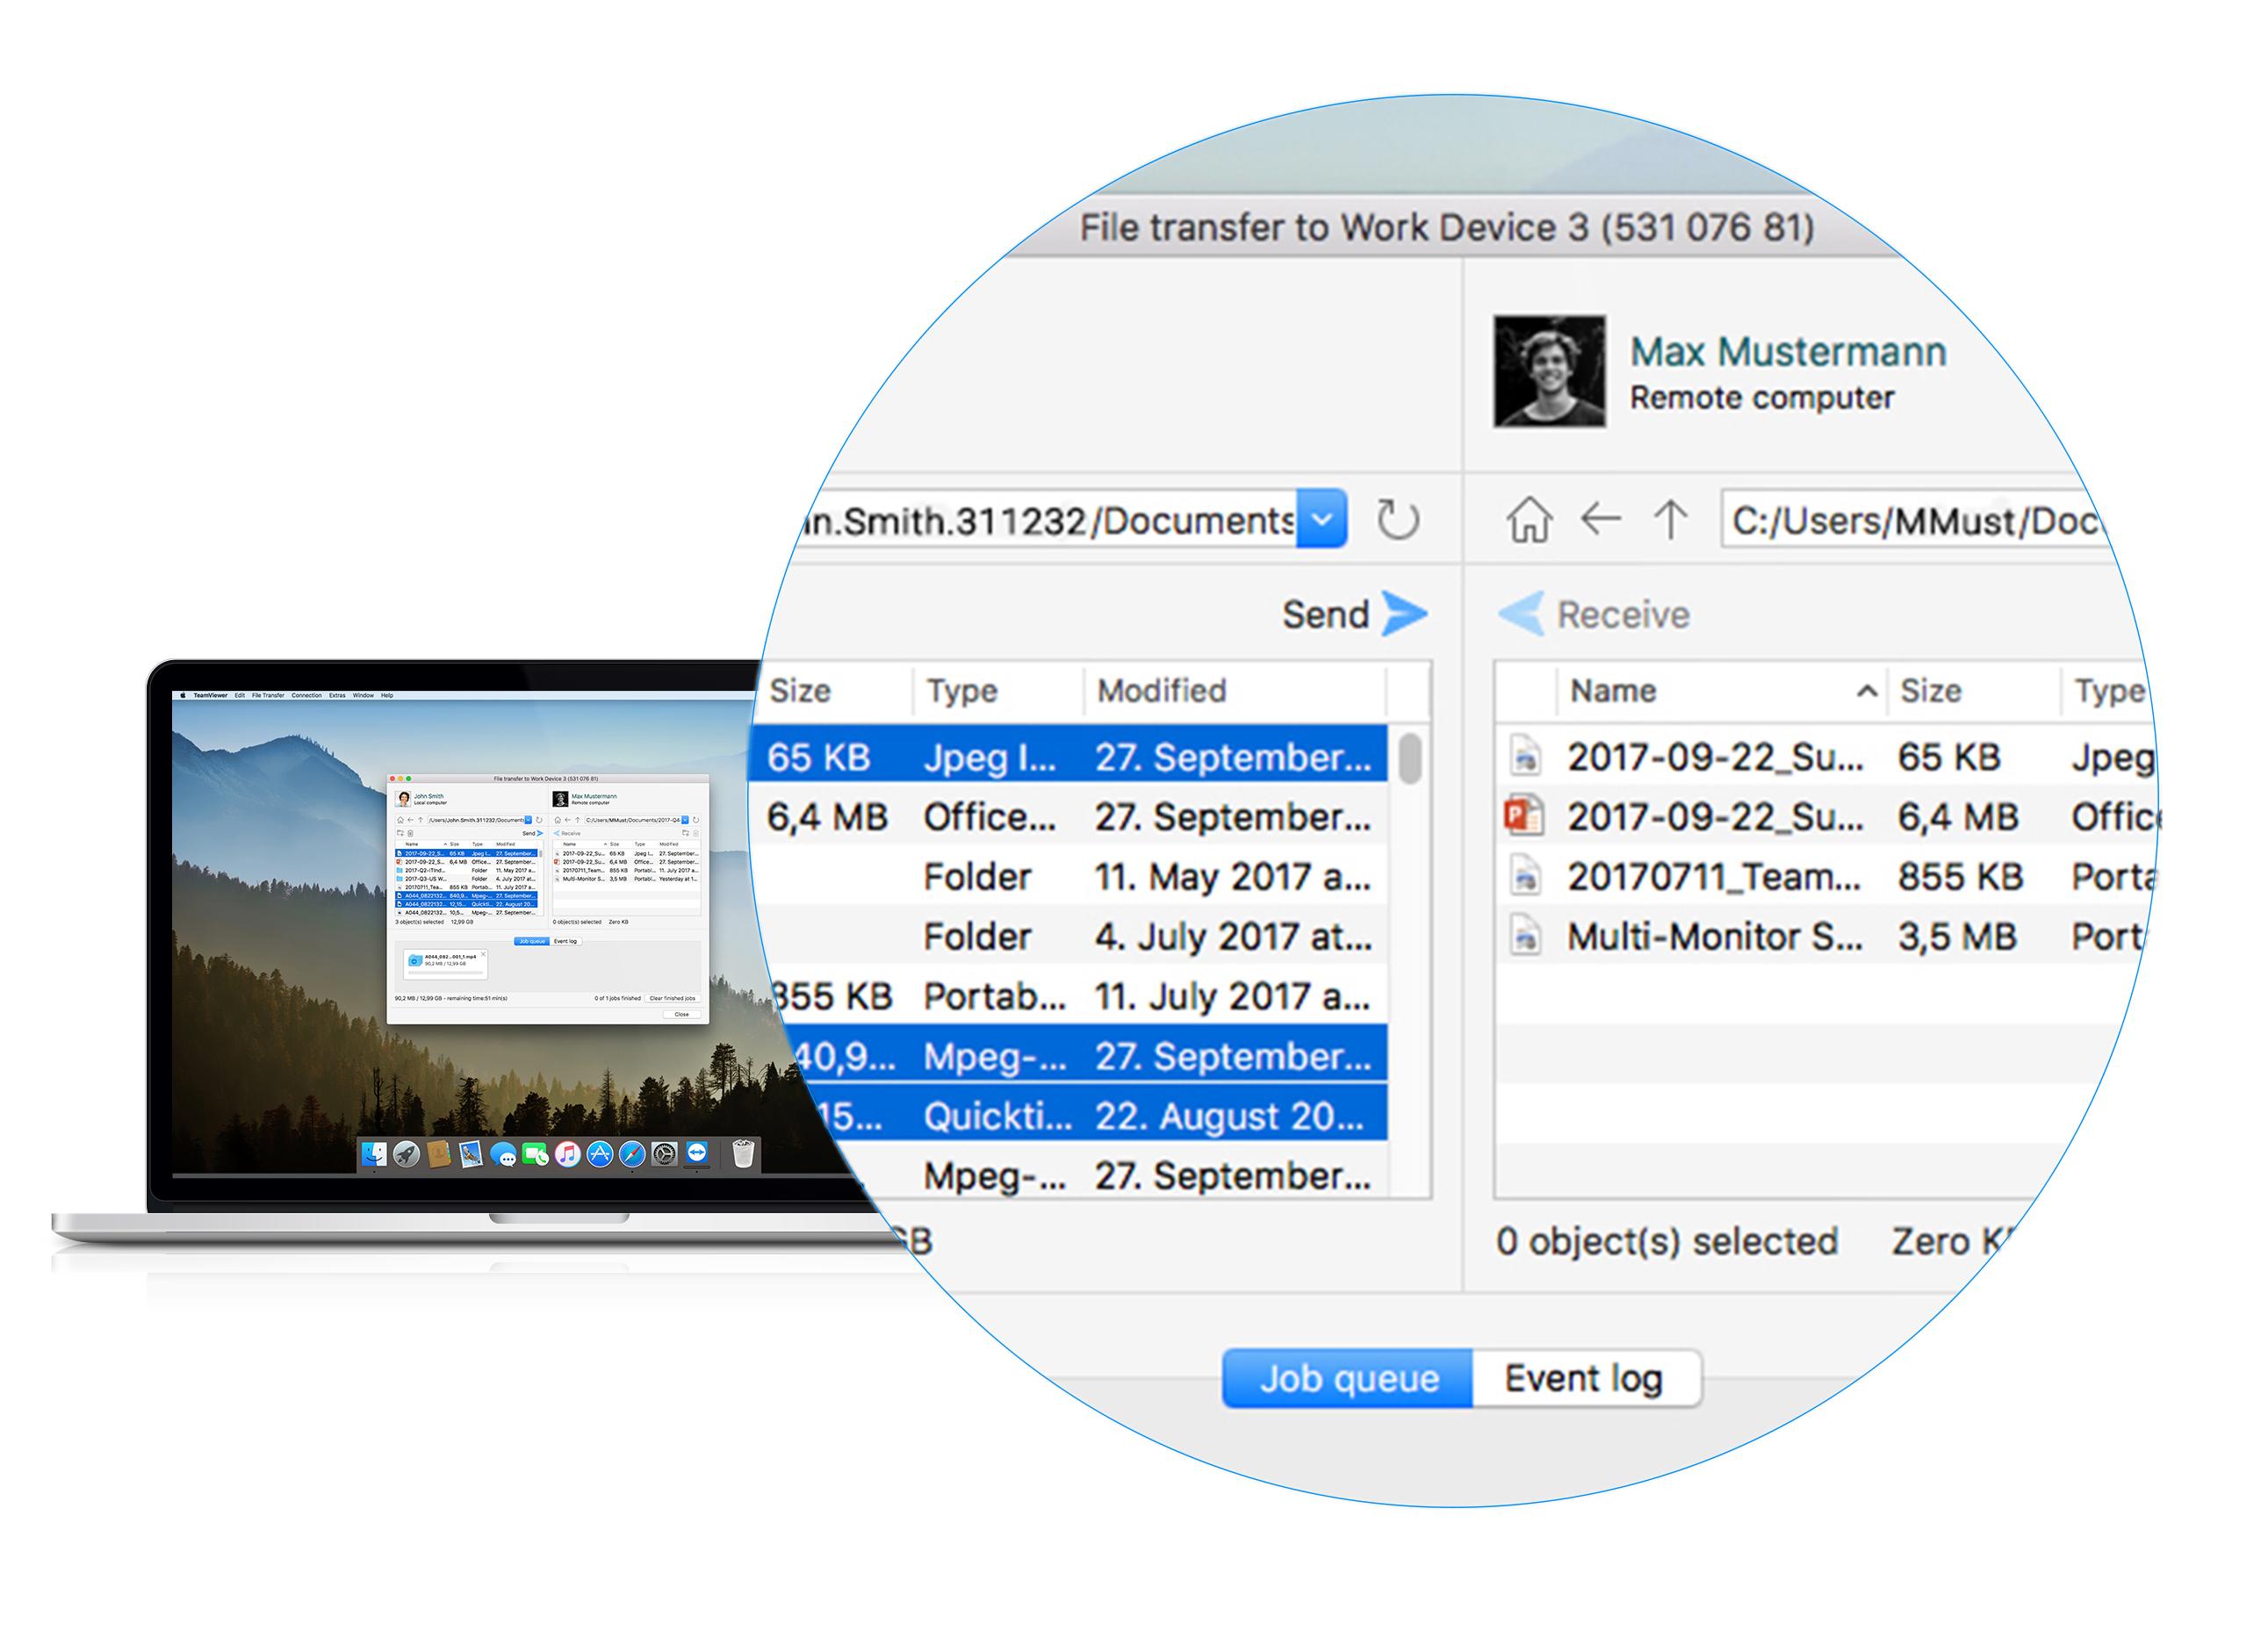 Teamviewer 13 linux download | Install Teamviewer 13 on CentOS 7